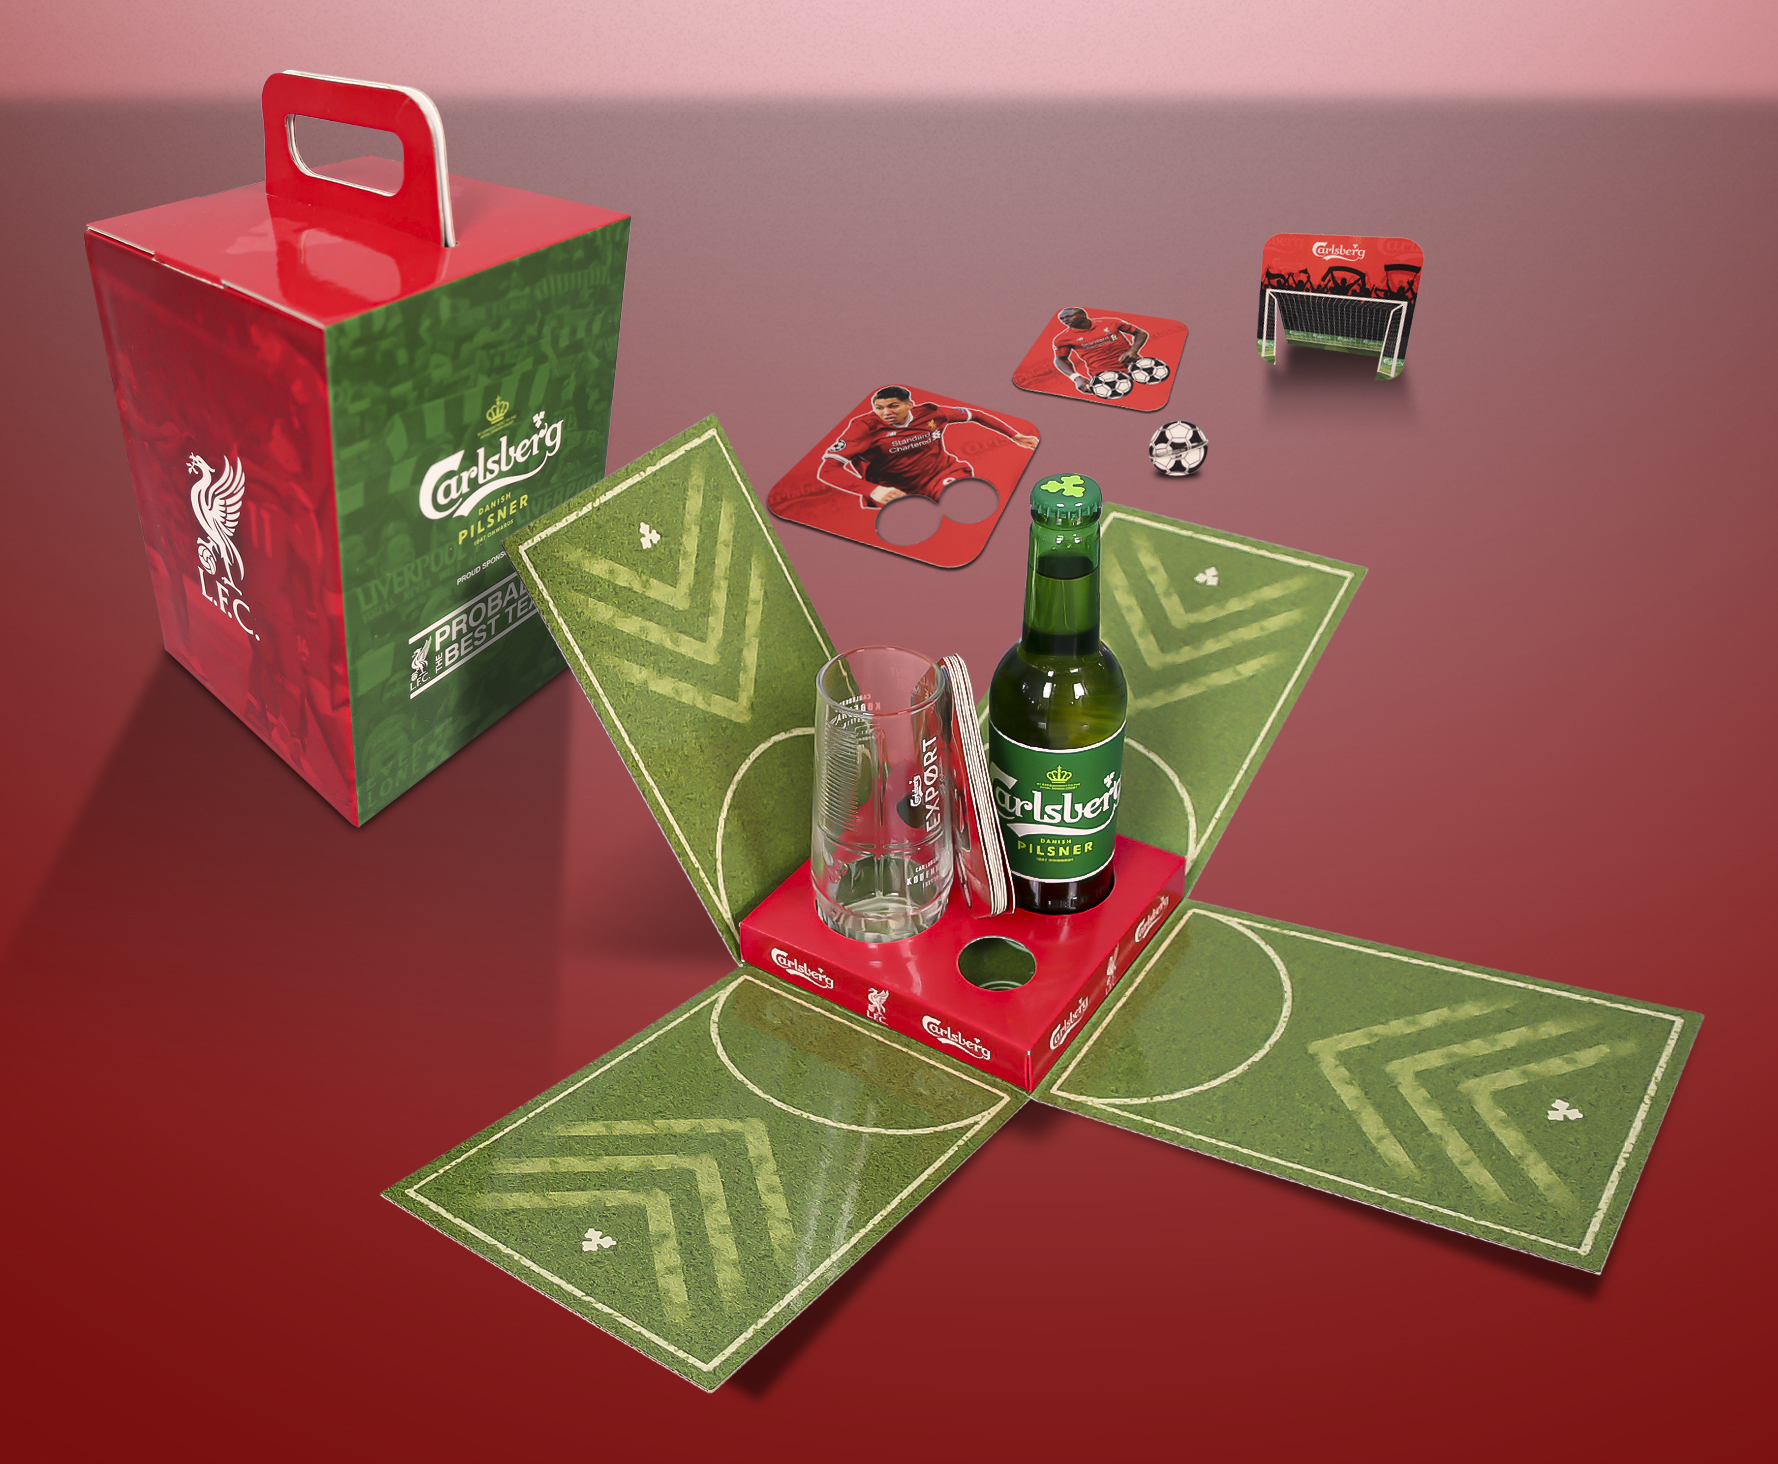 Carlsberg LFC Football Game Pack